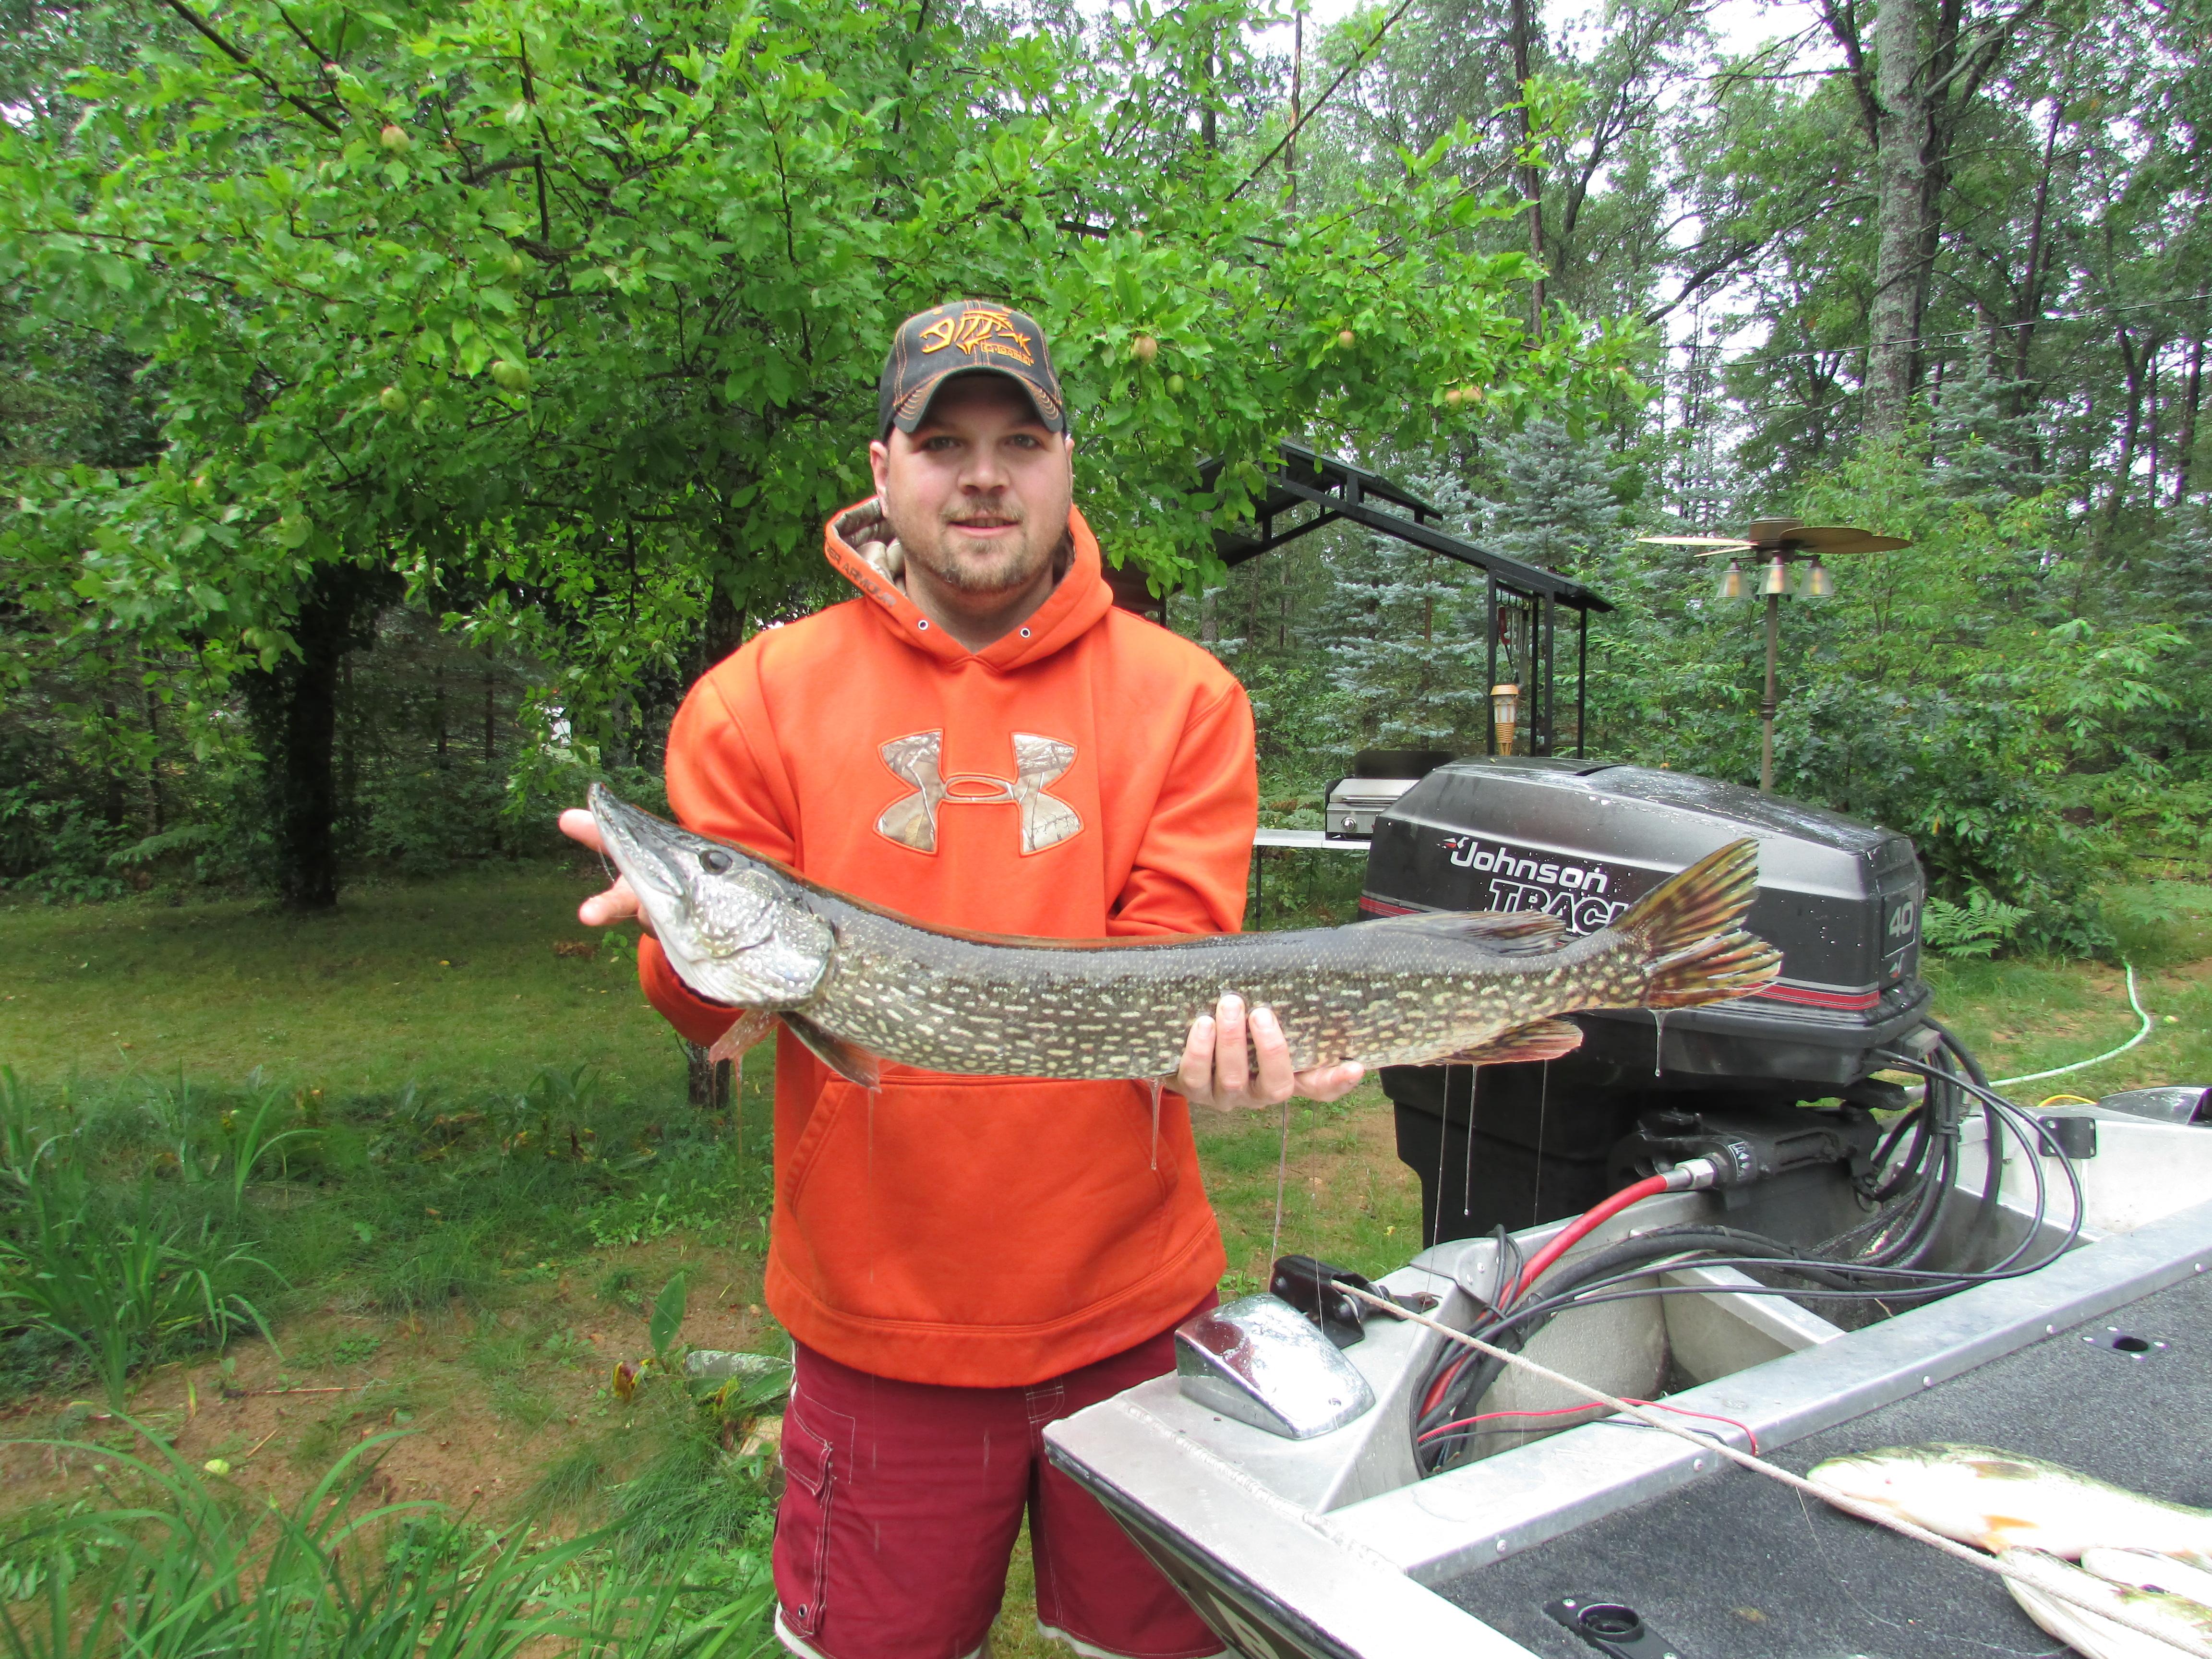 Best Bear Lodge & Campground Baldwin/Irons Area image 15